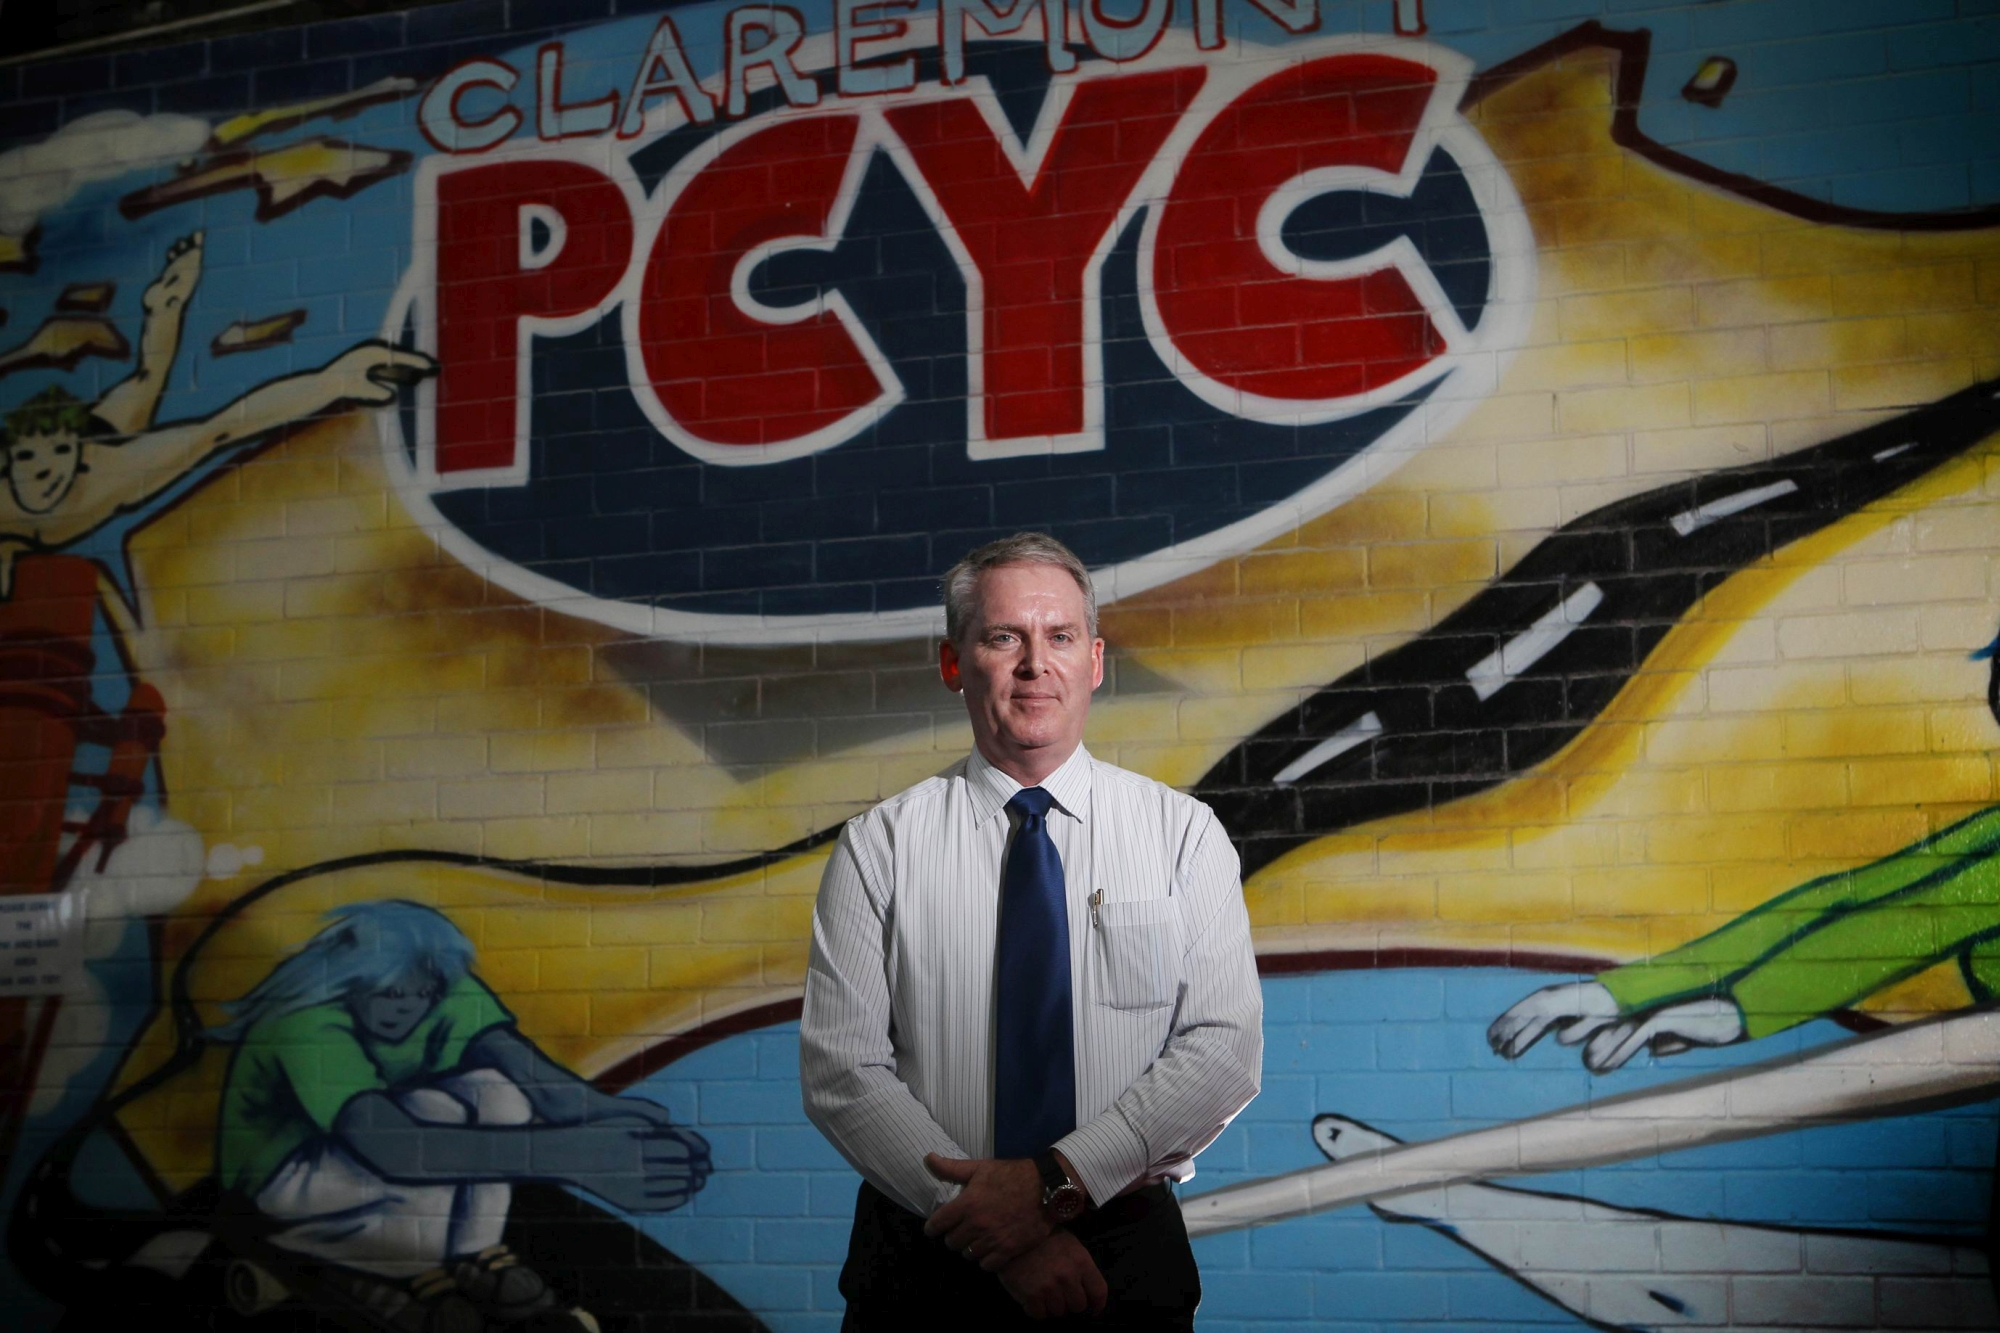 PCYC chief executive John Gillespie.